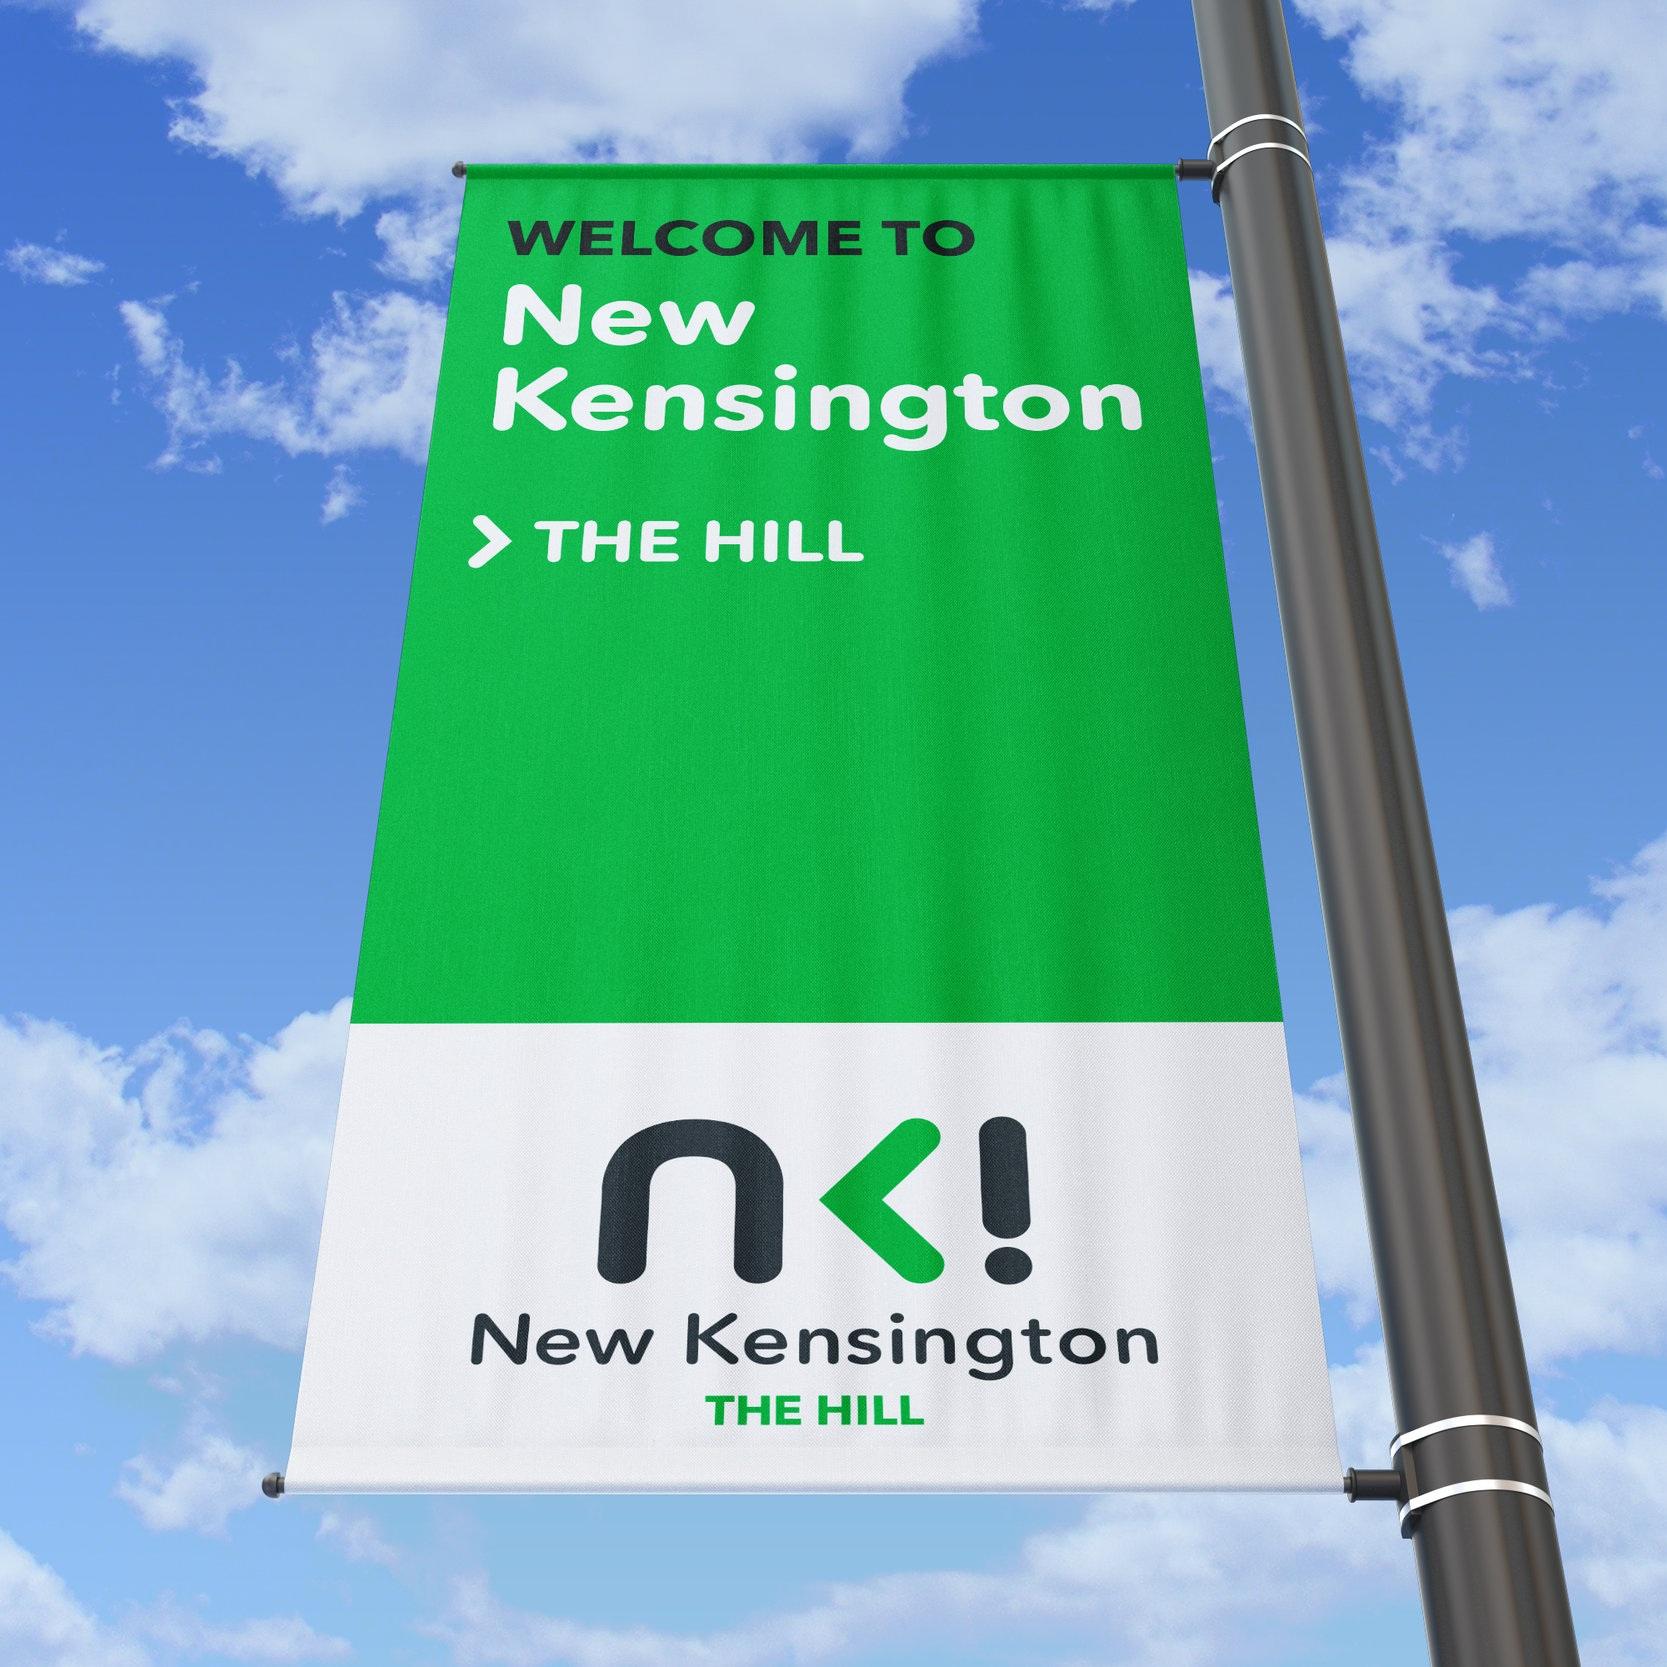 NewKen_Welcome_Poster_Concept1_TheHill.jpg